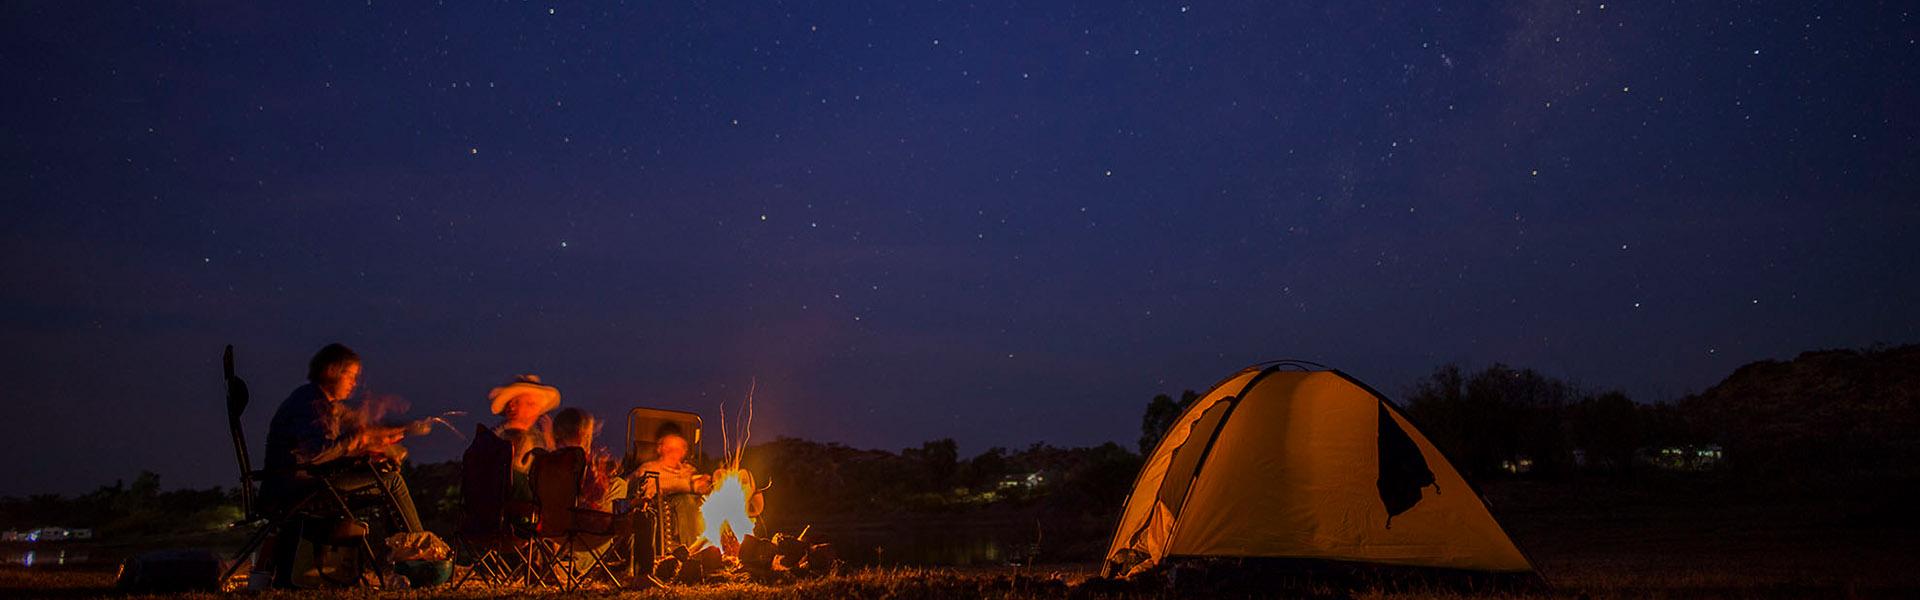 Corella Dam Night Camping Slider